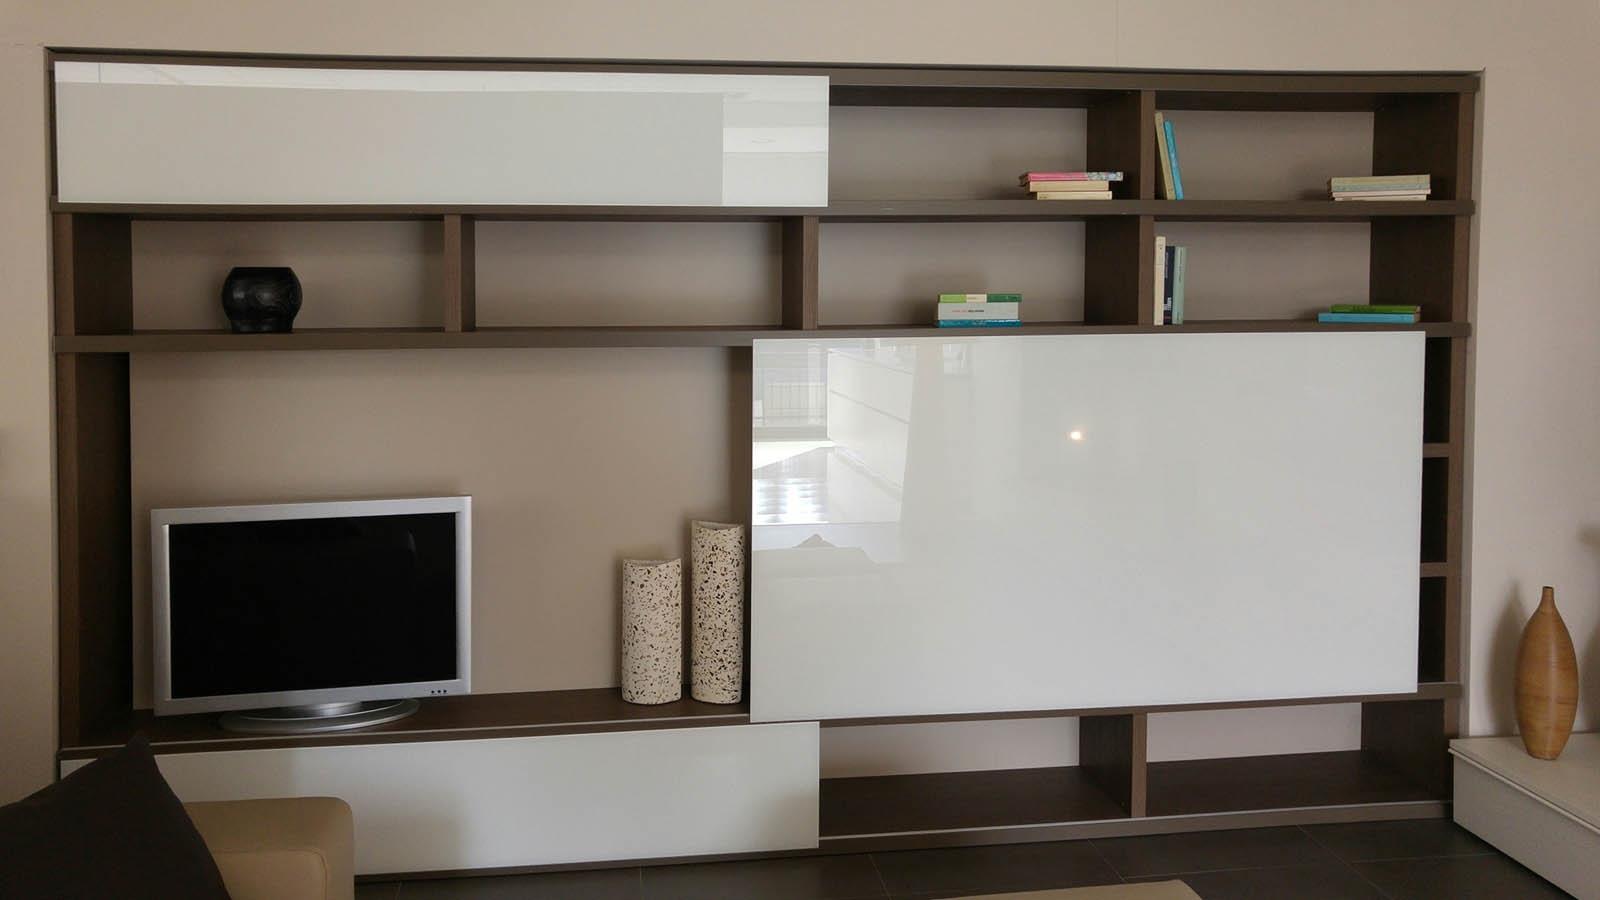 Arredamento librerie moderne tra le librerie ikea pi for Ingrosso arredamenti veneto